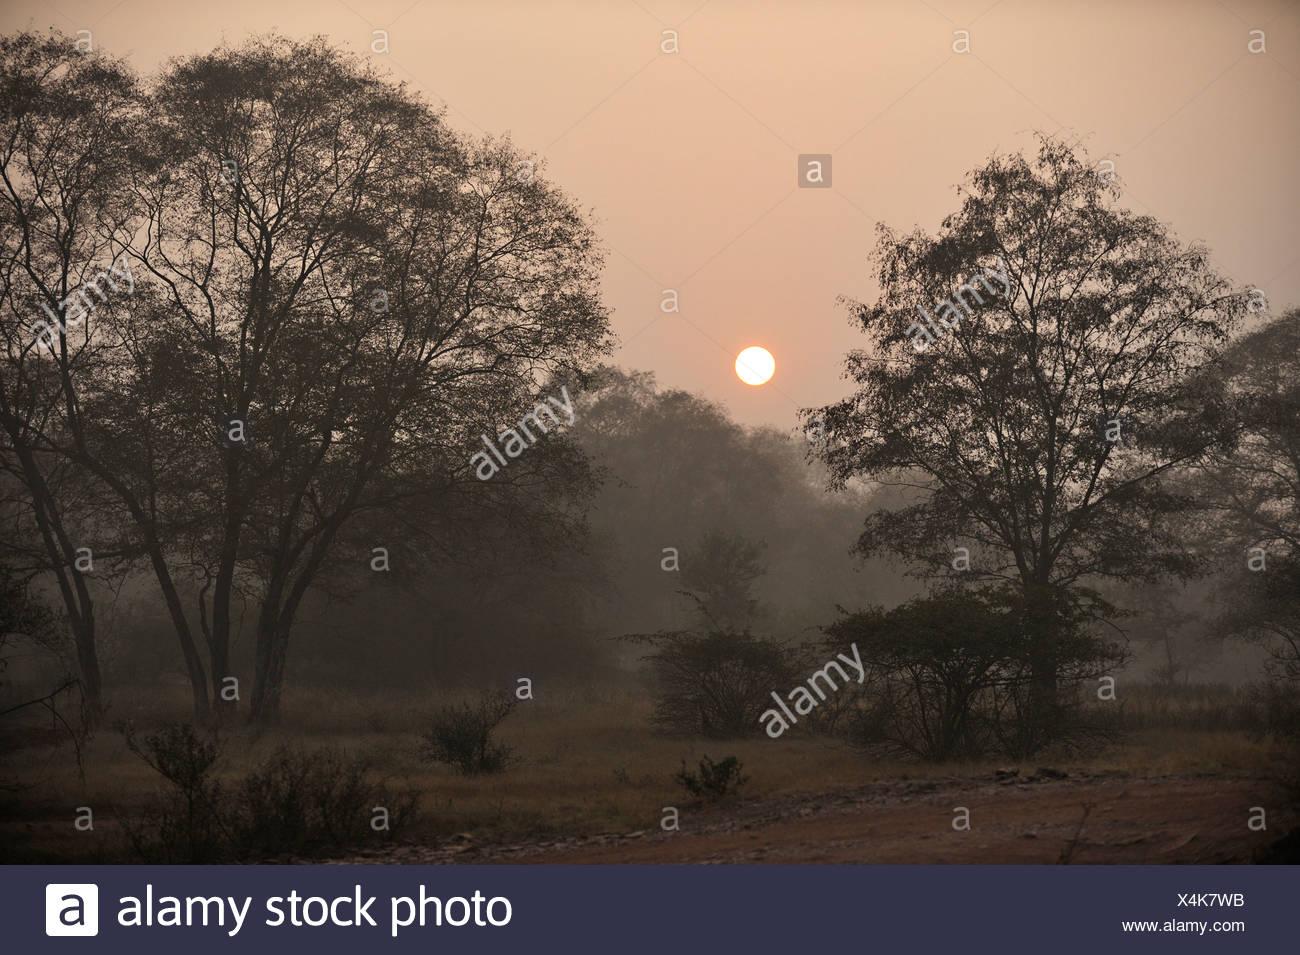 Jungles of Ranthambore National Park at sunrise, Rajasthan, India, Asia - Stock Image